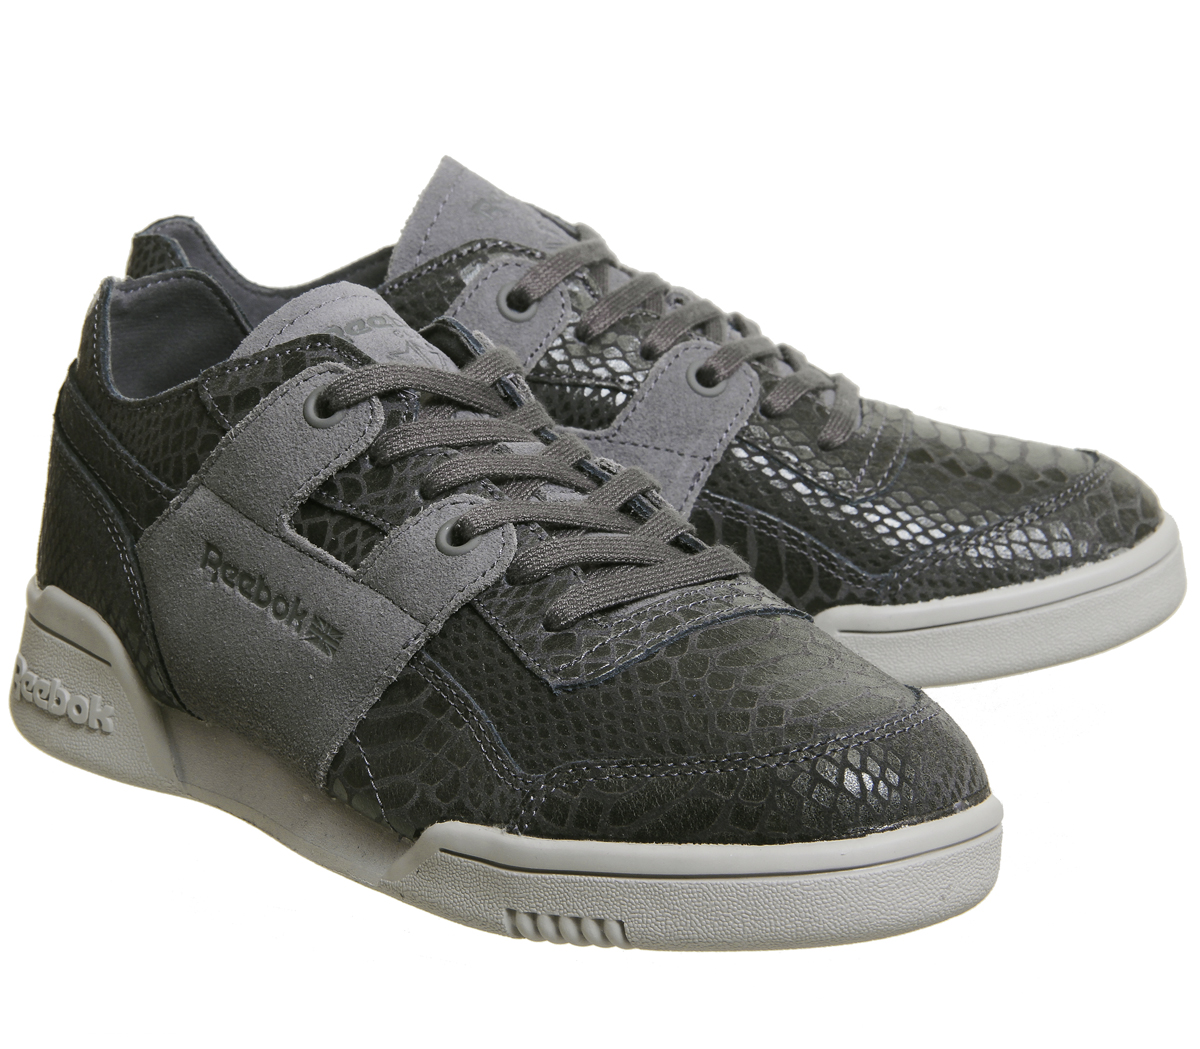 cf2077e51f3f Womens Reebok Workout Plus ASH GREY FOIL Trainers Shoes